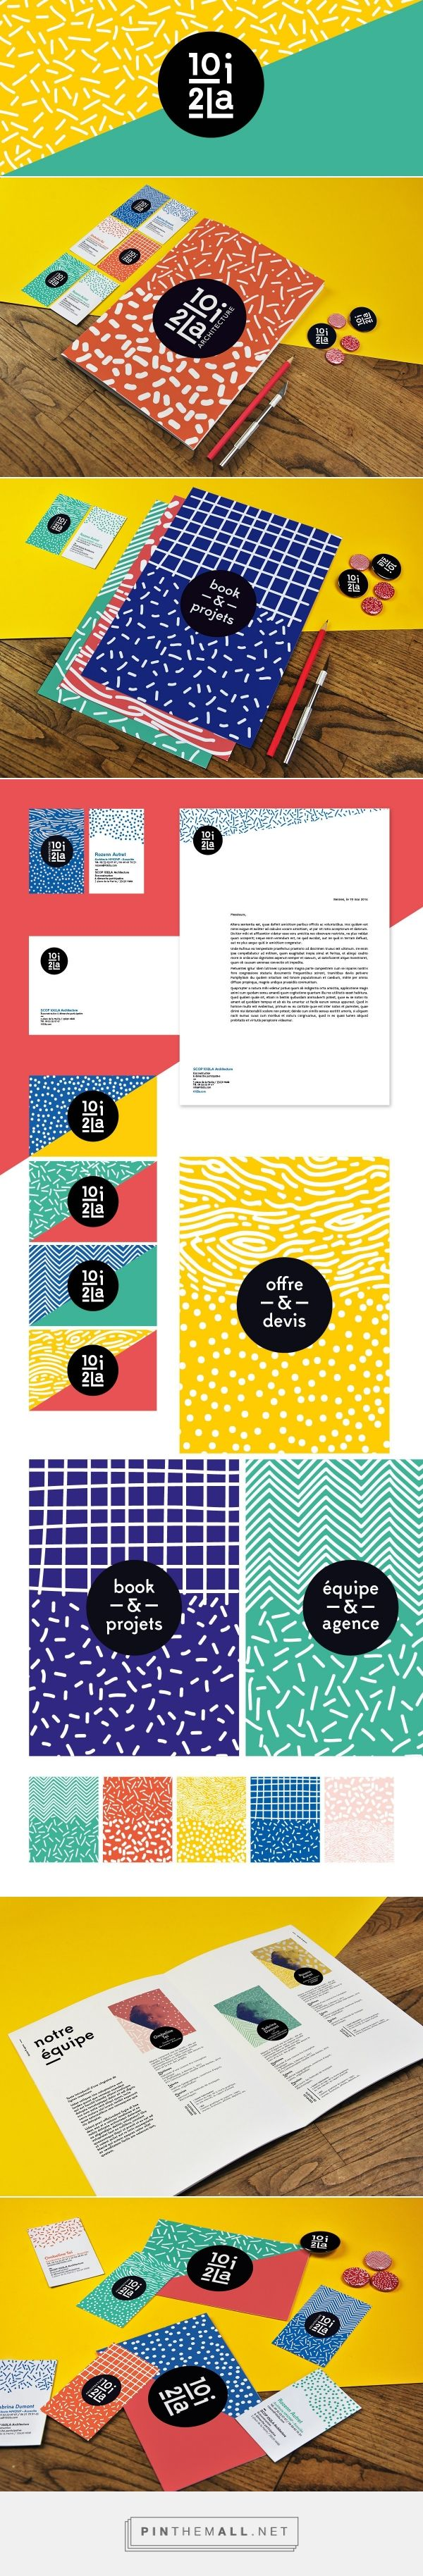 10i21LA Architecture Branding by Pollen Studio | Fivestar Branding – Design and Branding Agency & Inspiration Gallery